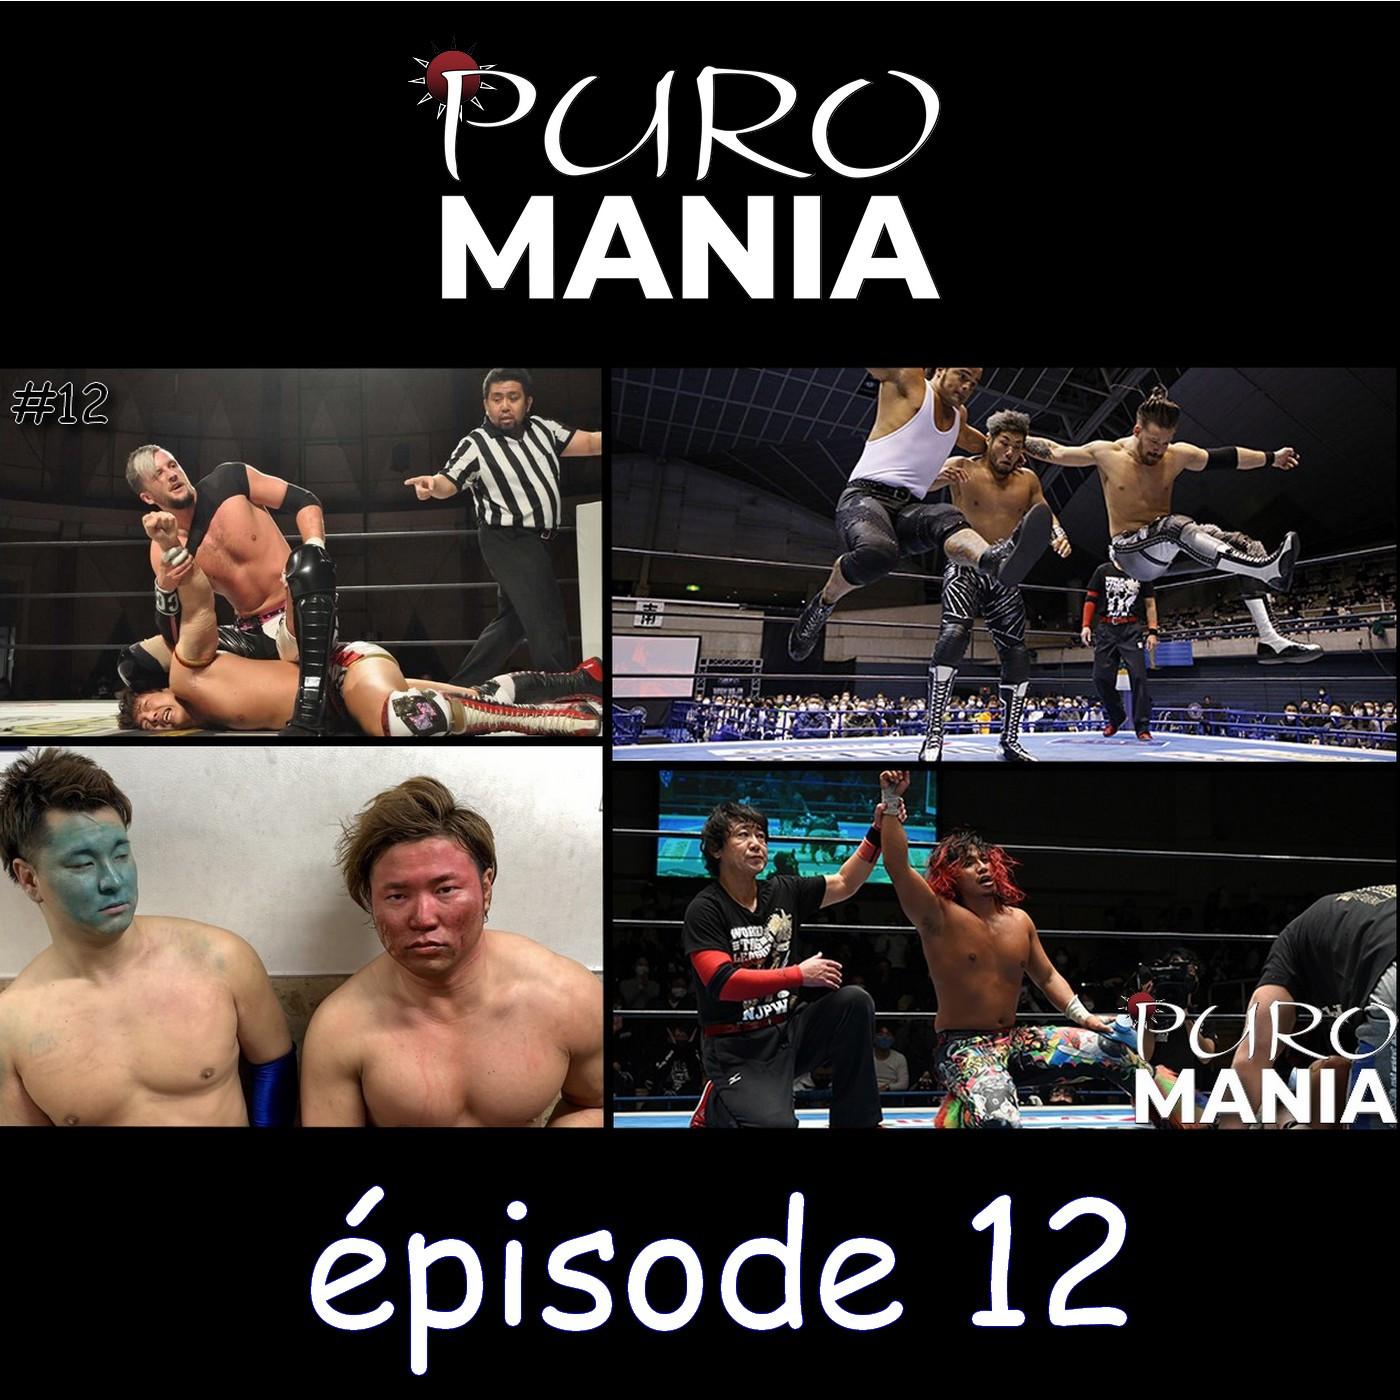 PuroMania #12 : Tag League NJPW - 4,5,6 et AJPW - 3,4, BOSJ - 4,5,6 + DDT D-Ou Grand Prix 2,3,4